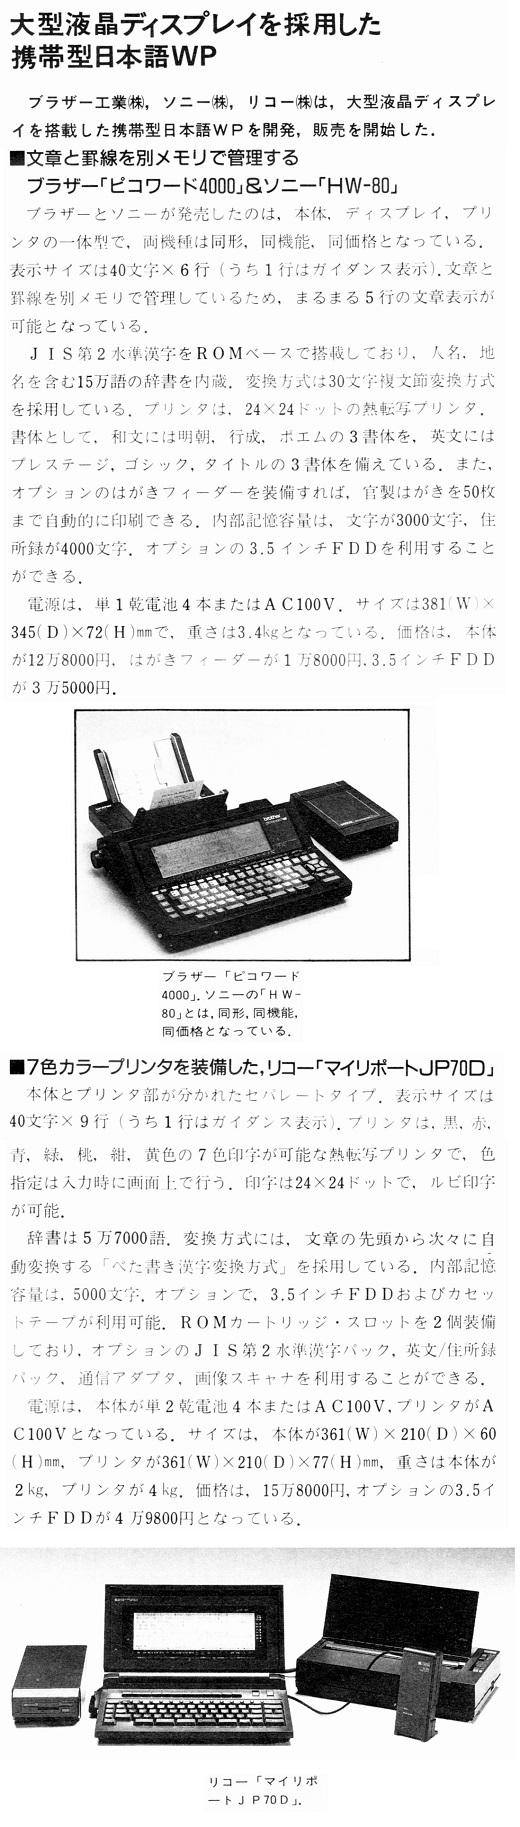 ASCII1986(07)b10_大型液晶ディスプレイのワープロW520.jpg